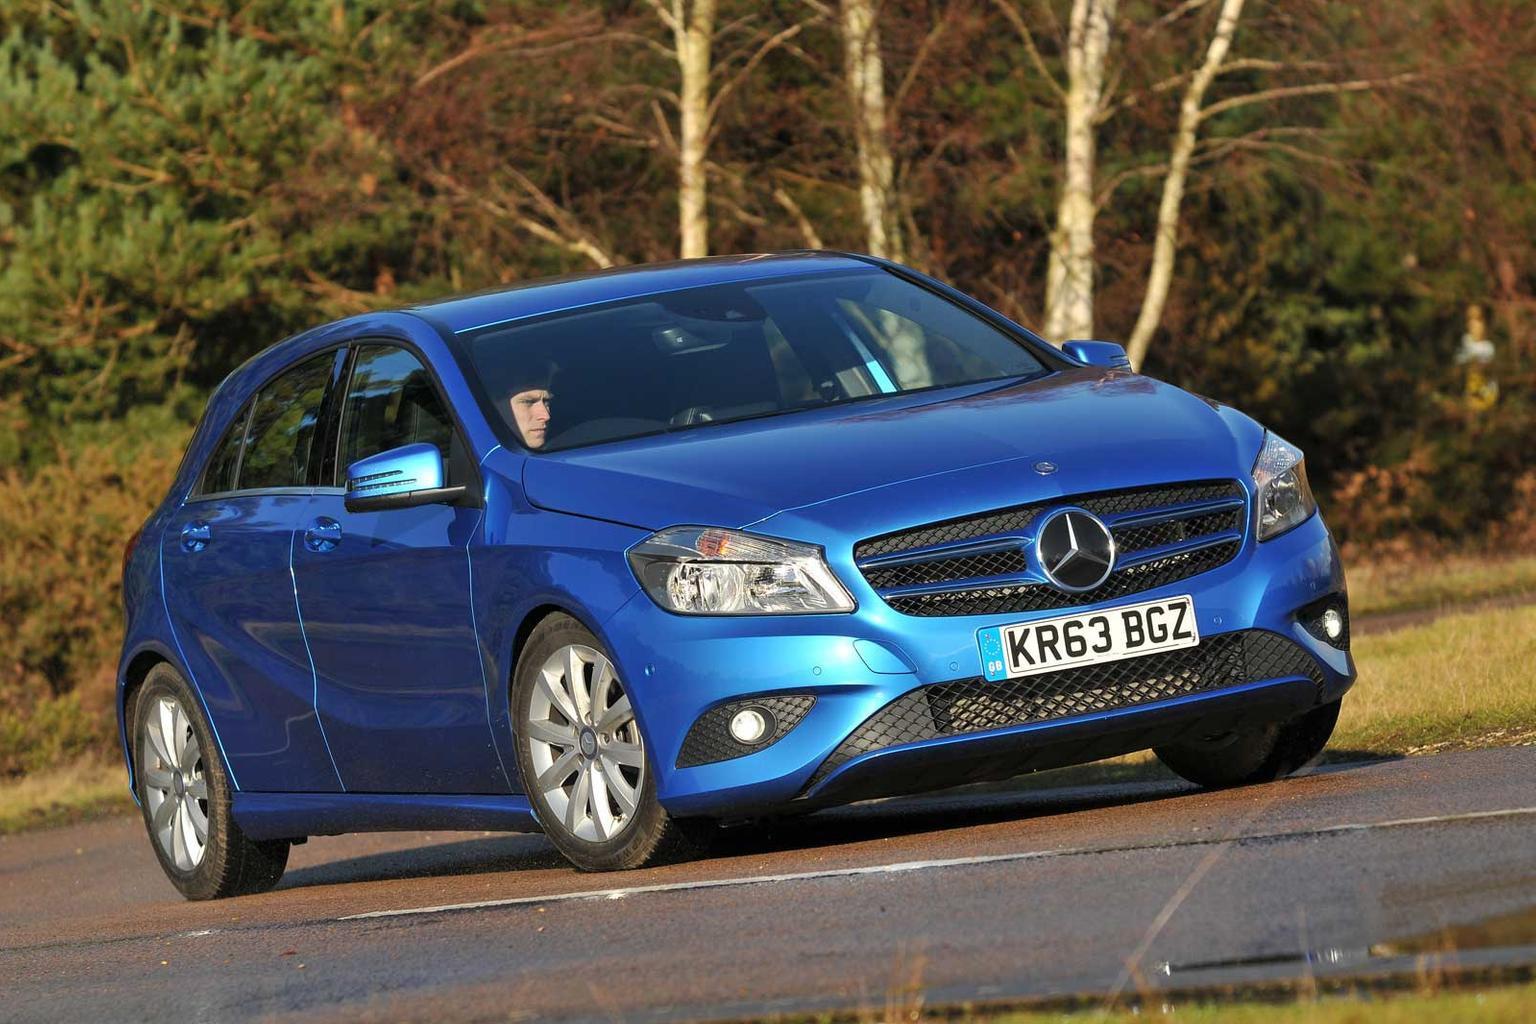 2014 Mercedes A180 CDI Eco review